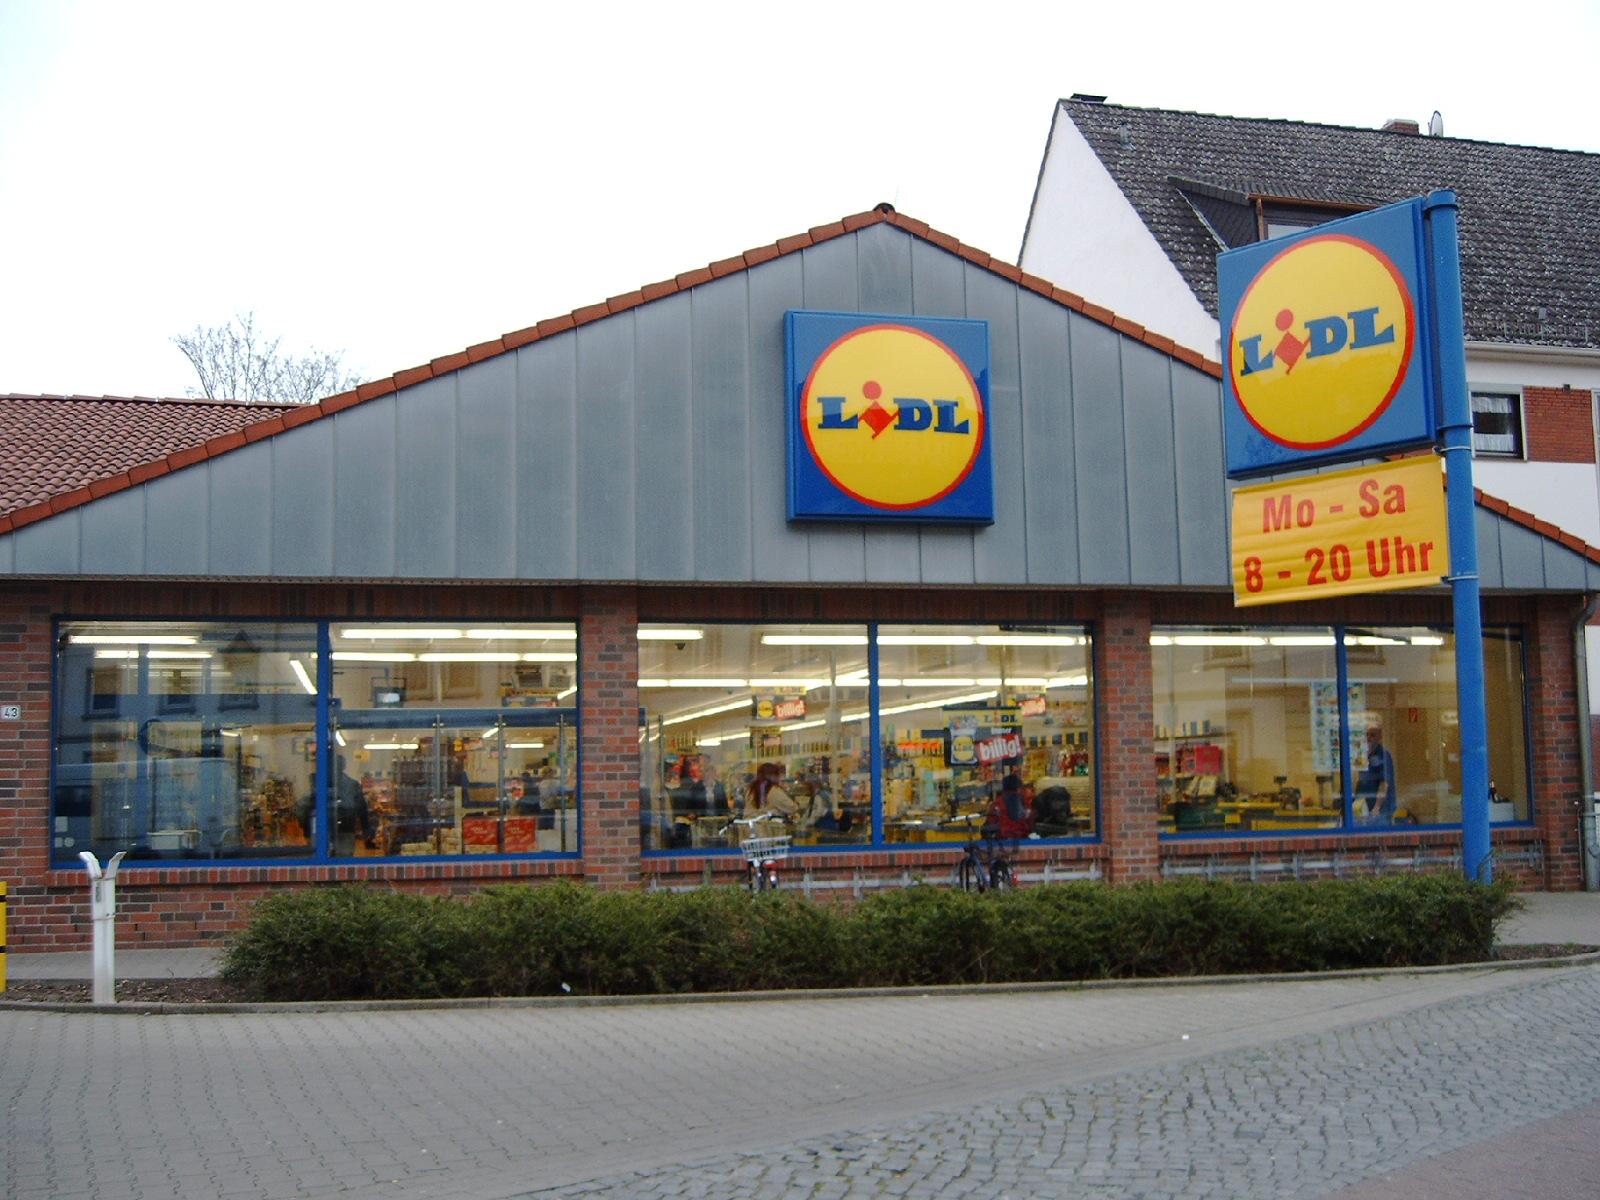 Lidel_Groepelingen_1.JPG